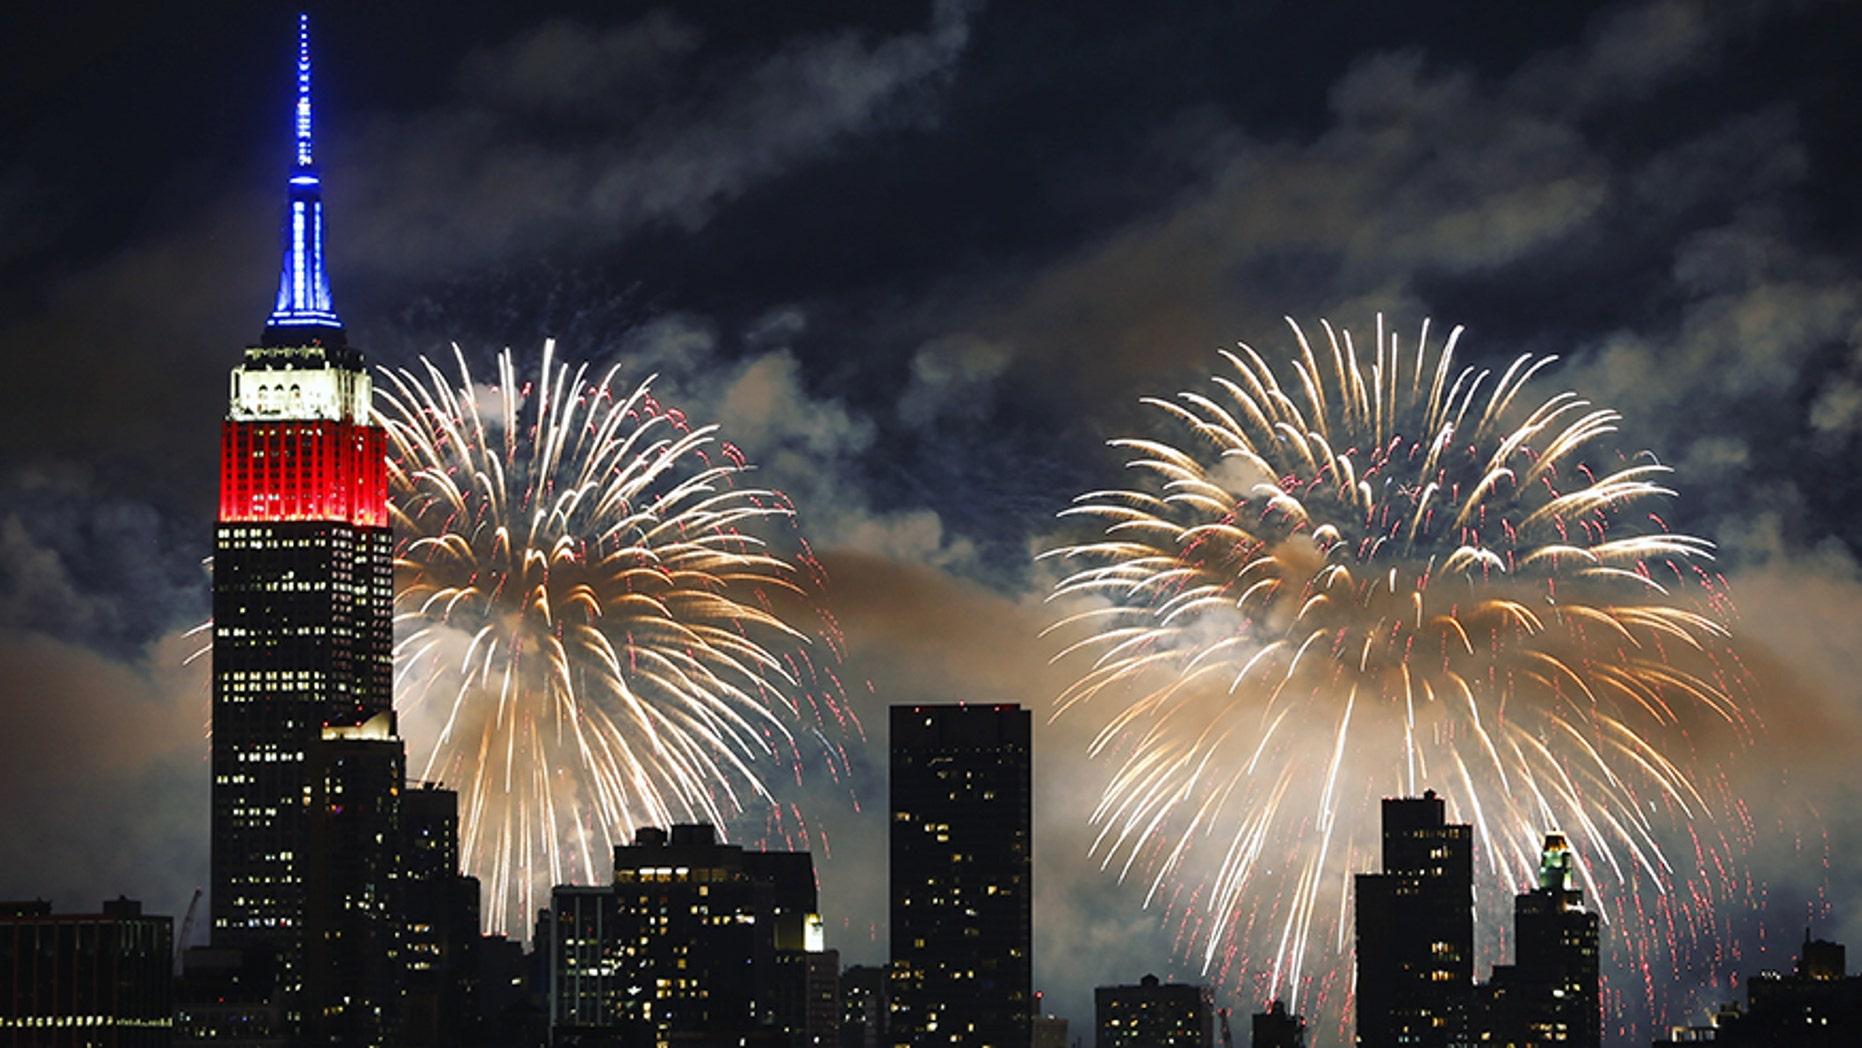 Fireworks light up the sky over New York City, July 4.